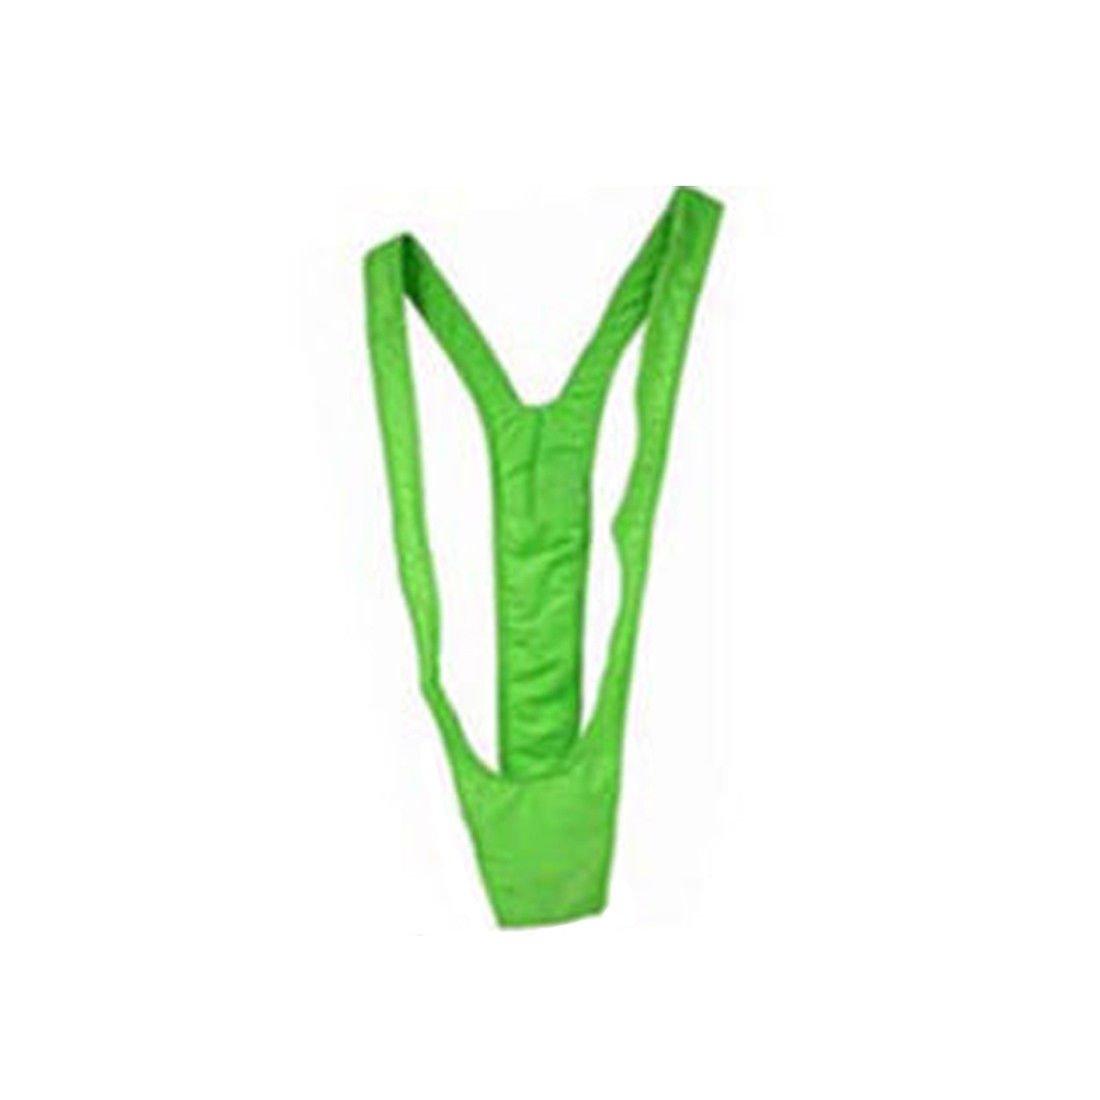 59ff48c4287de Borat Mankini Costume Green Swimsuit Mens Swimwear Thong Bikini Mankini EA   Amazon.com.au  Home